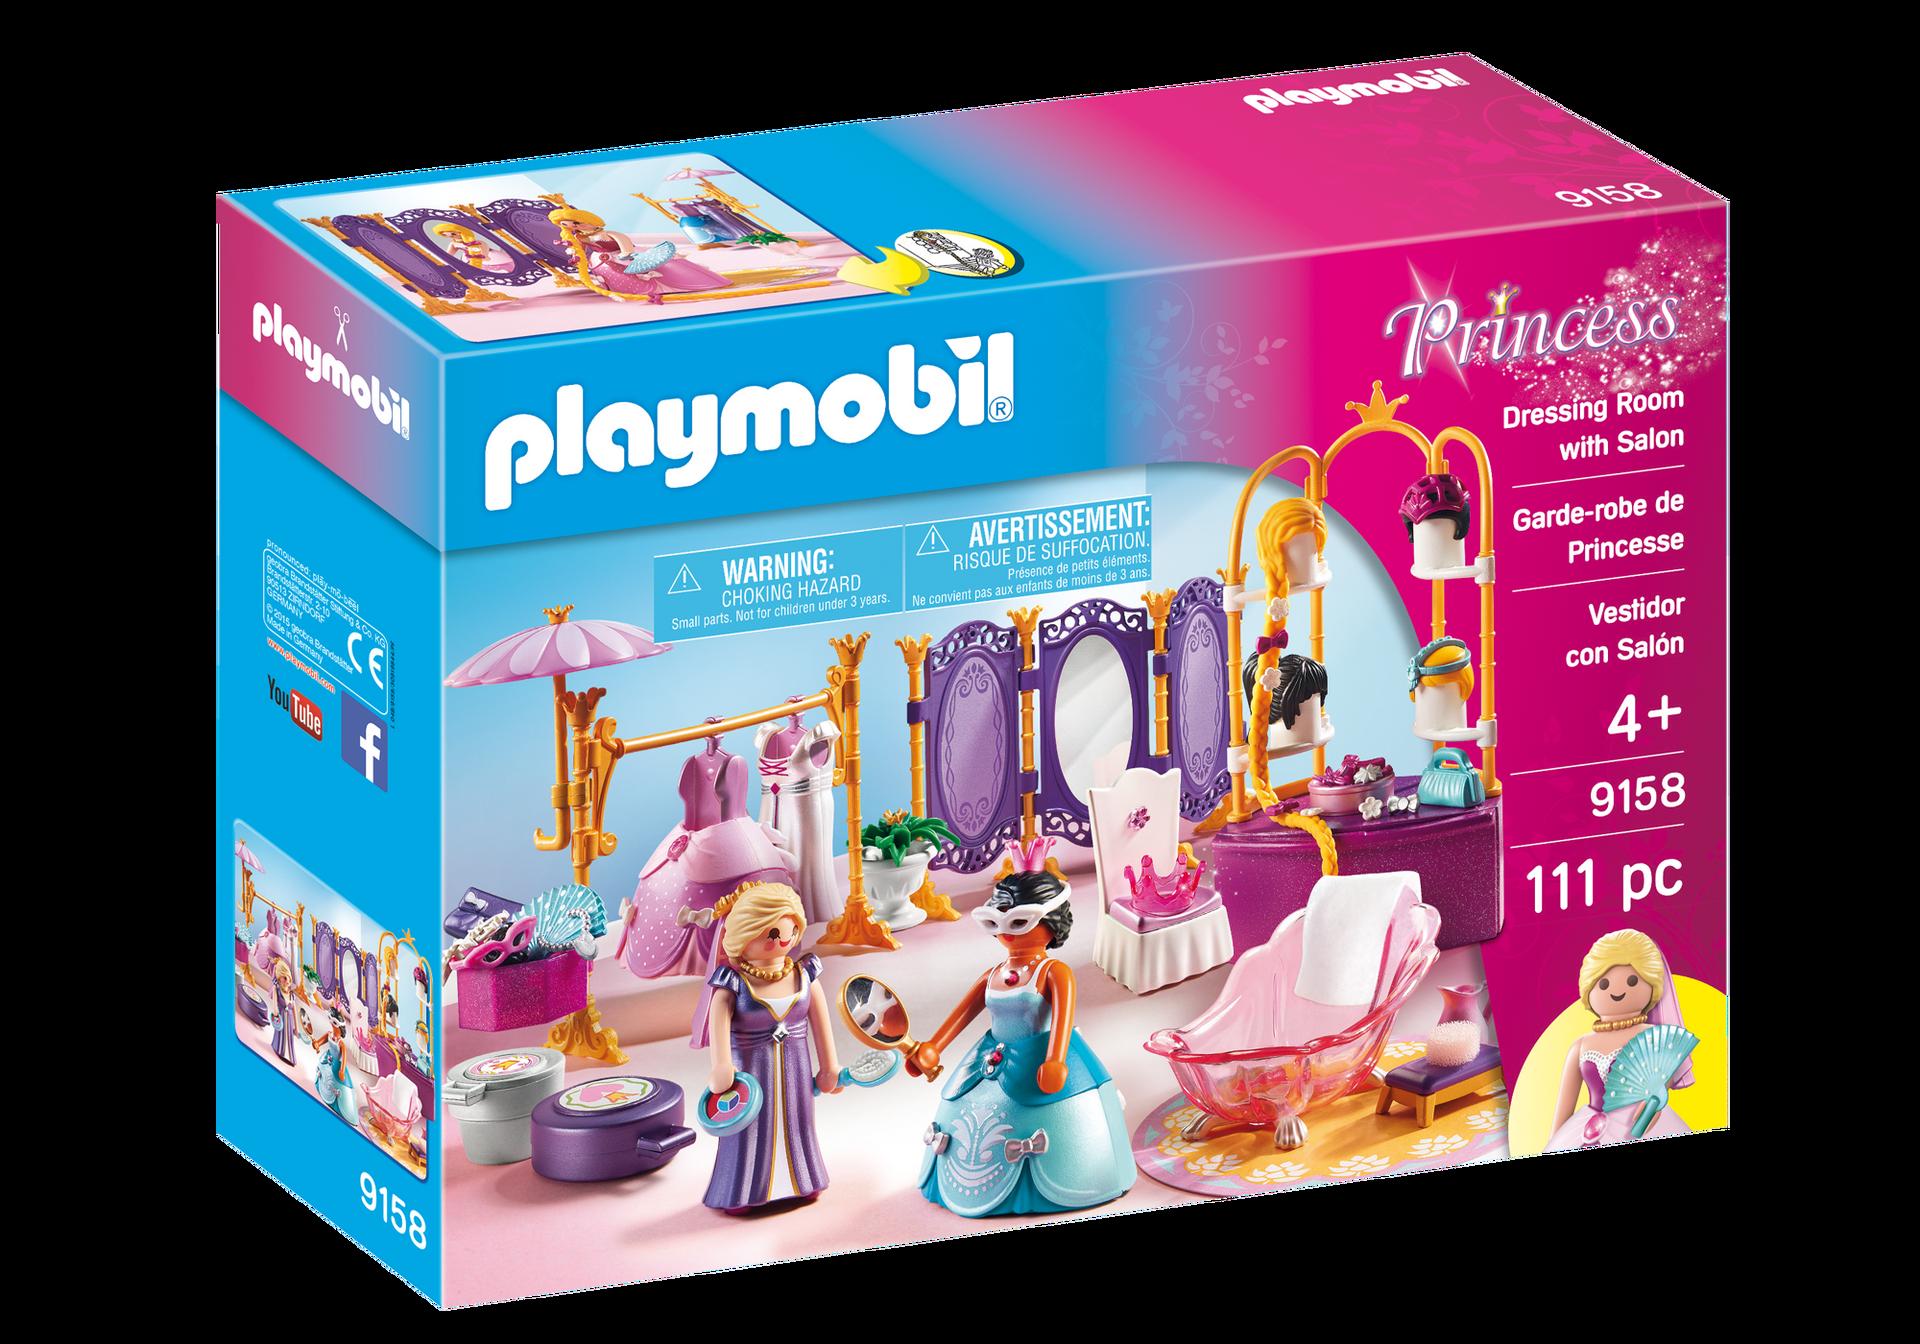 Dressing room with salon 9158 playmobil usa for Salon playmobil